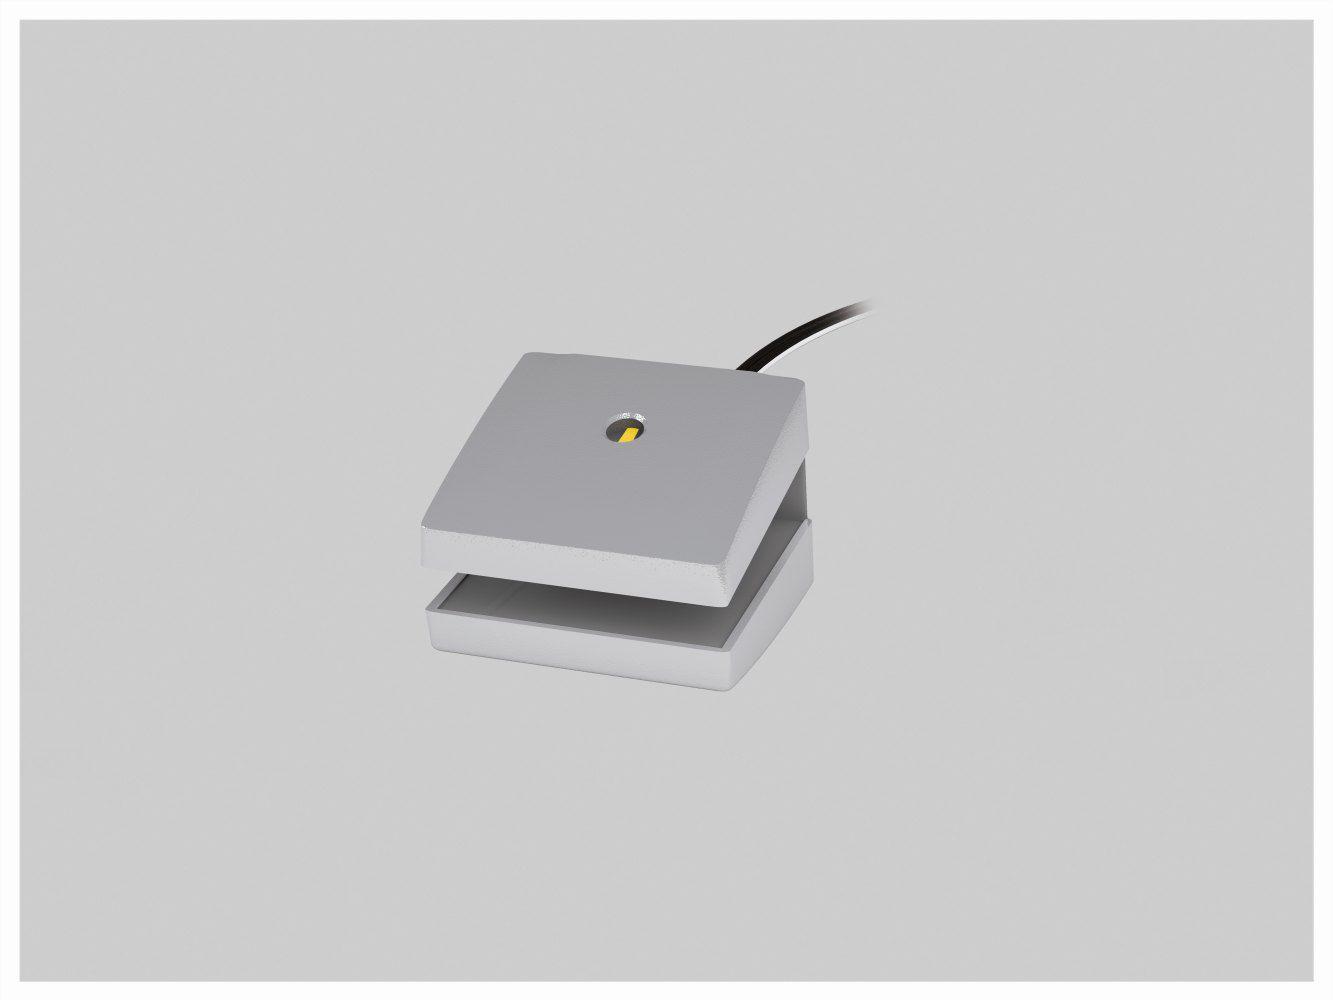 LED-verlichting - 3 LED